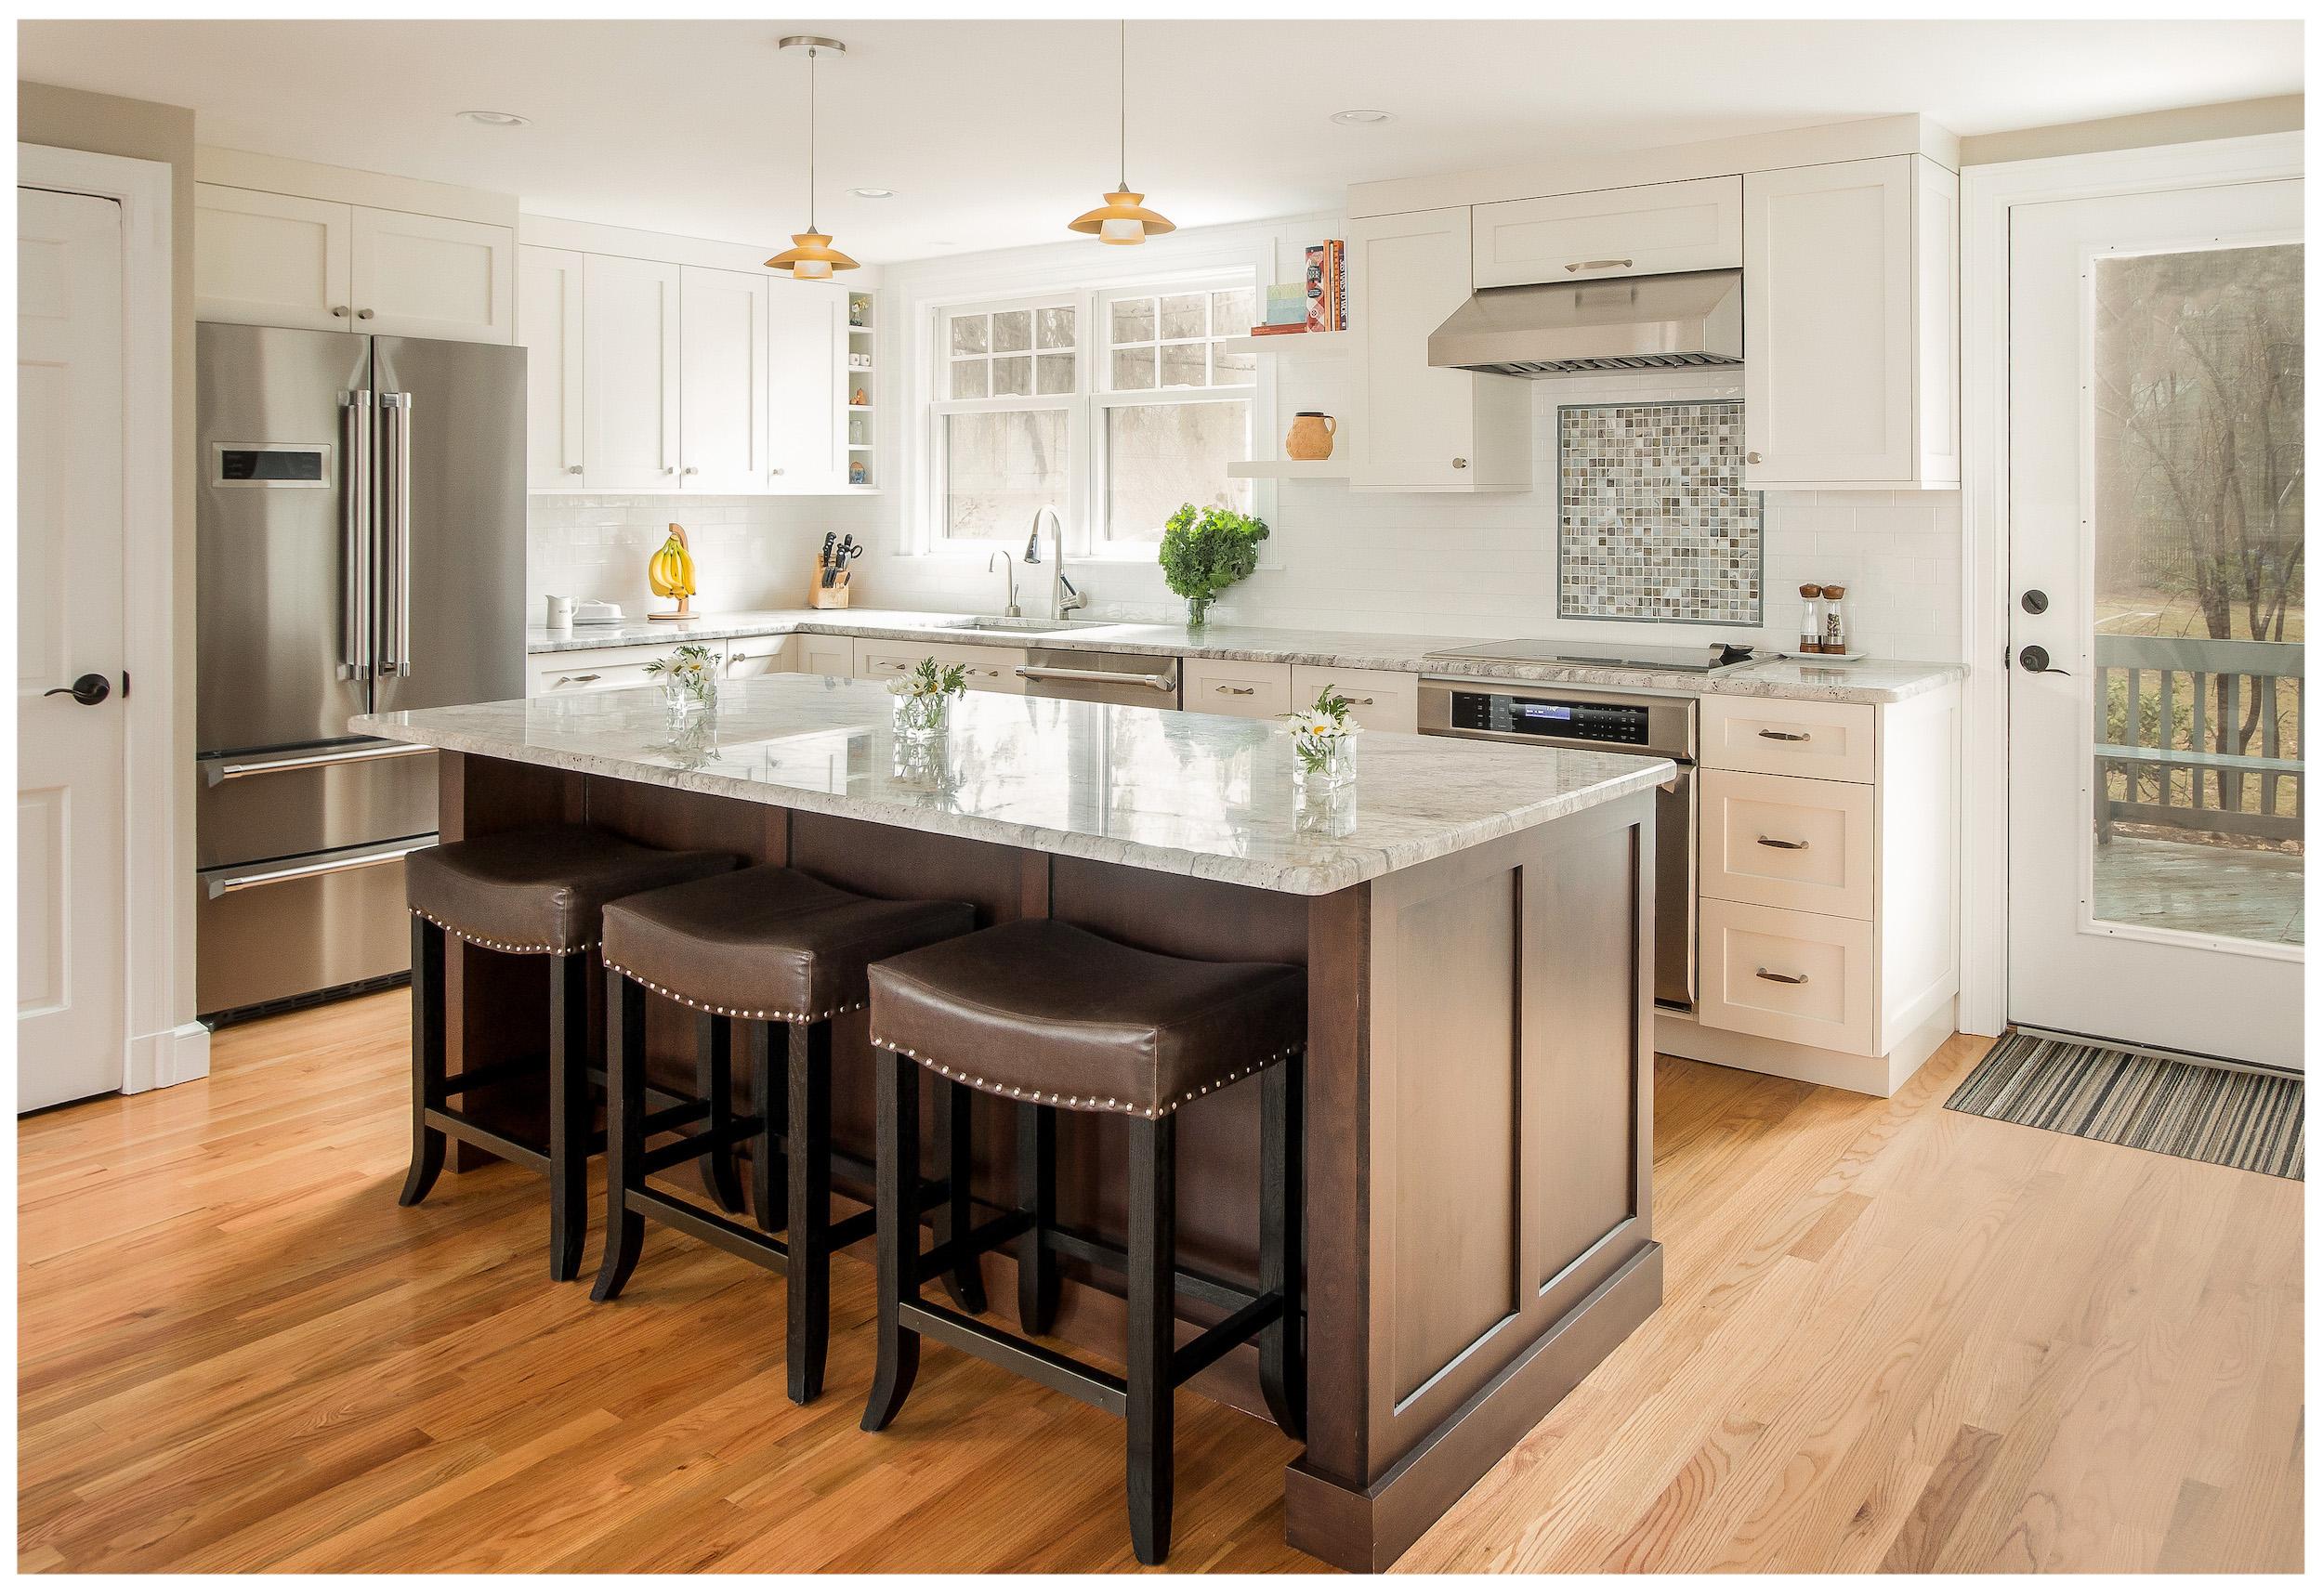 KitchenVisions-New-Traditional-Kitchen-Newton-2.jpg